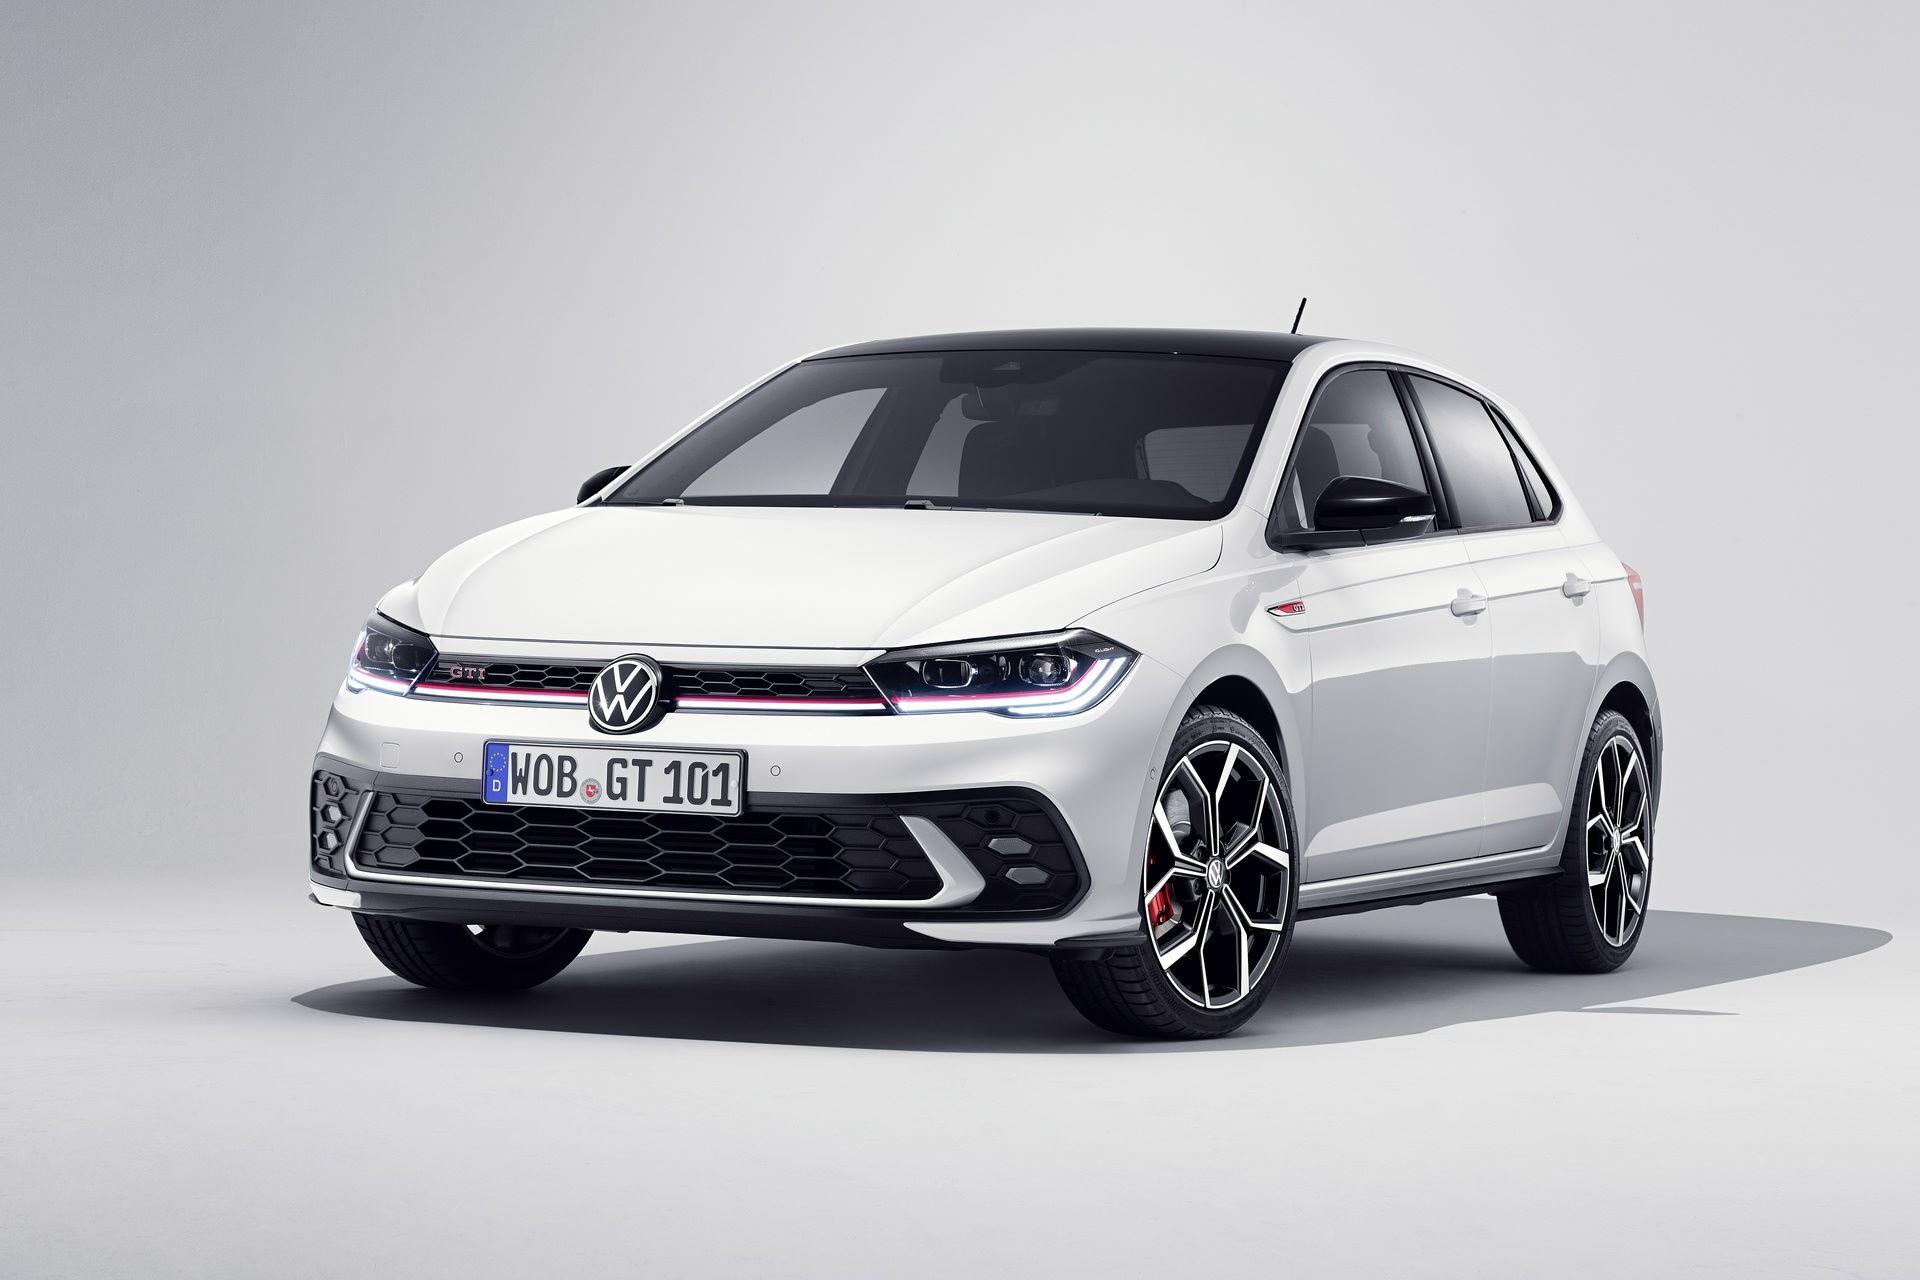 VW-Polo-GTI-facelift